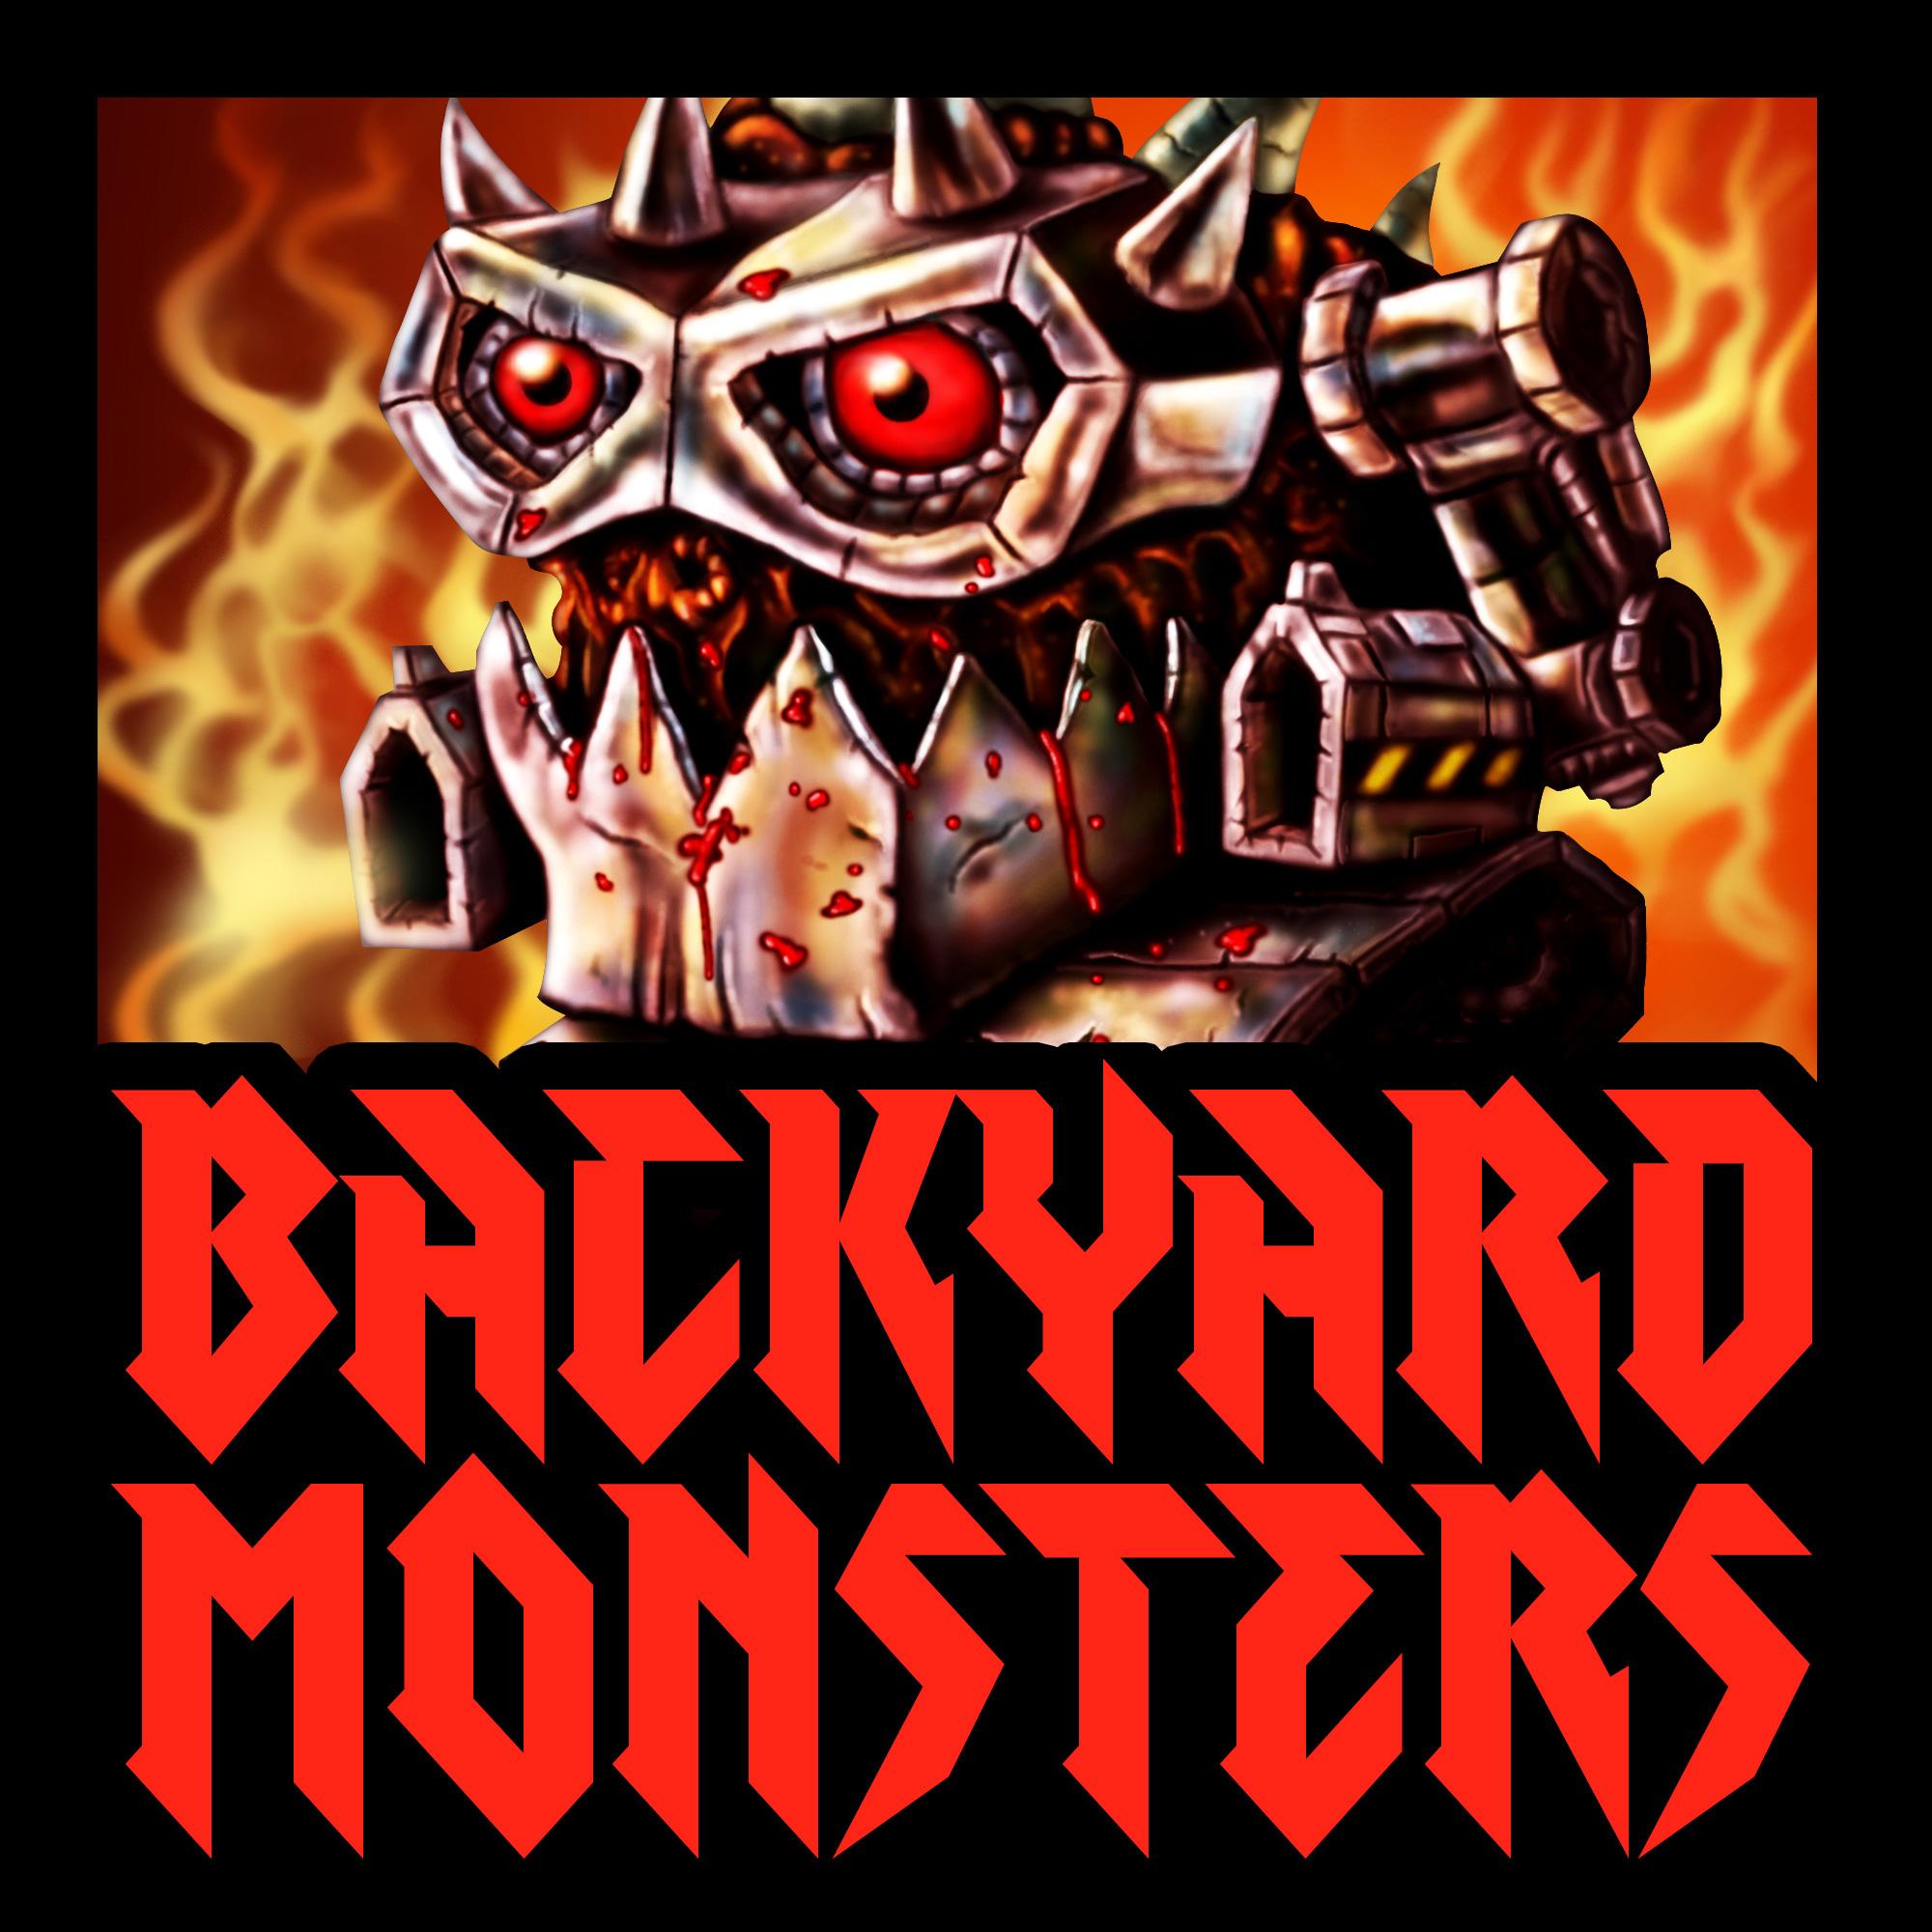 +46 Backyard Monsters Inferno | Outdoorhom